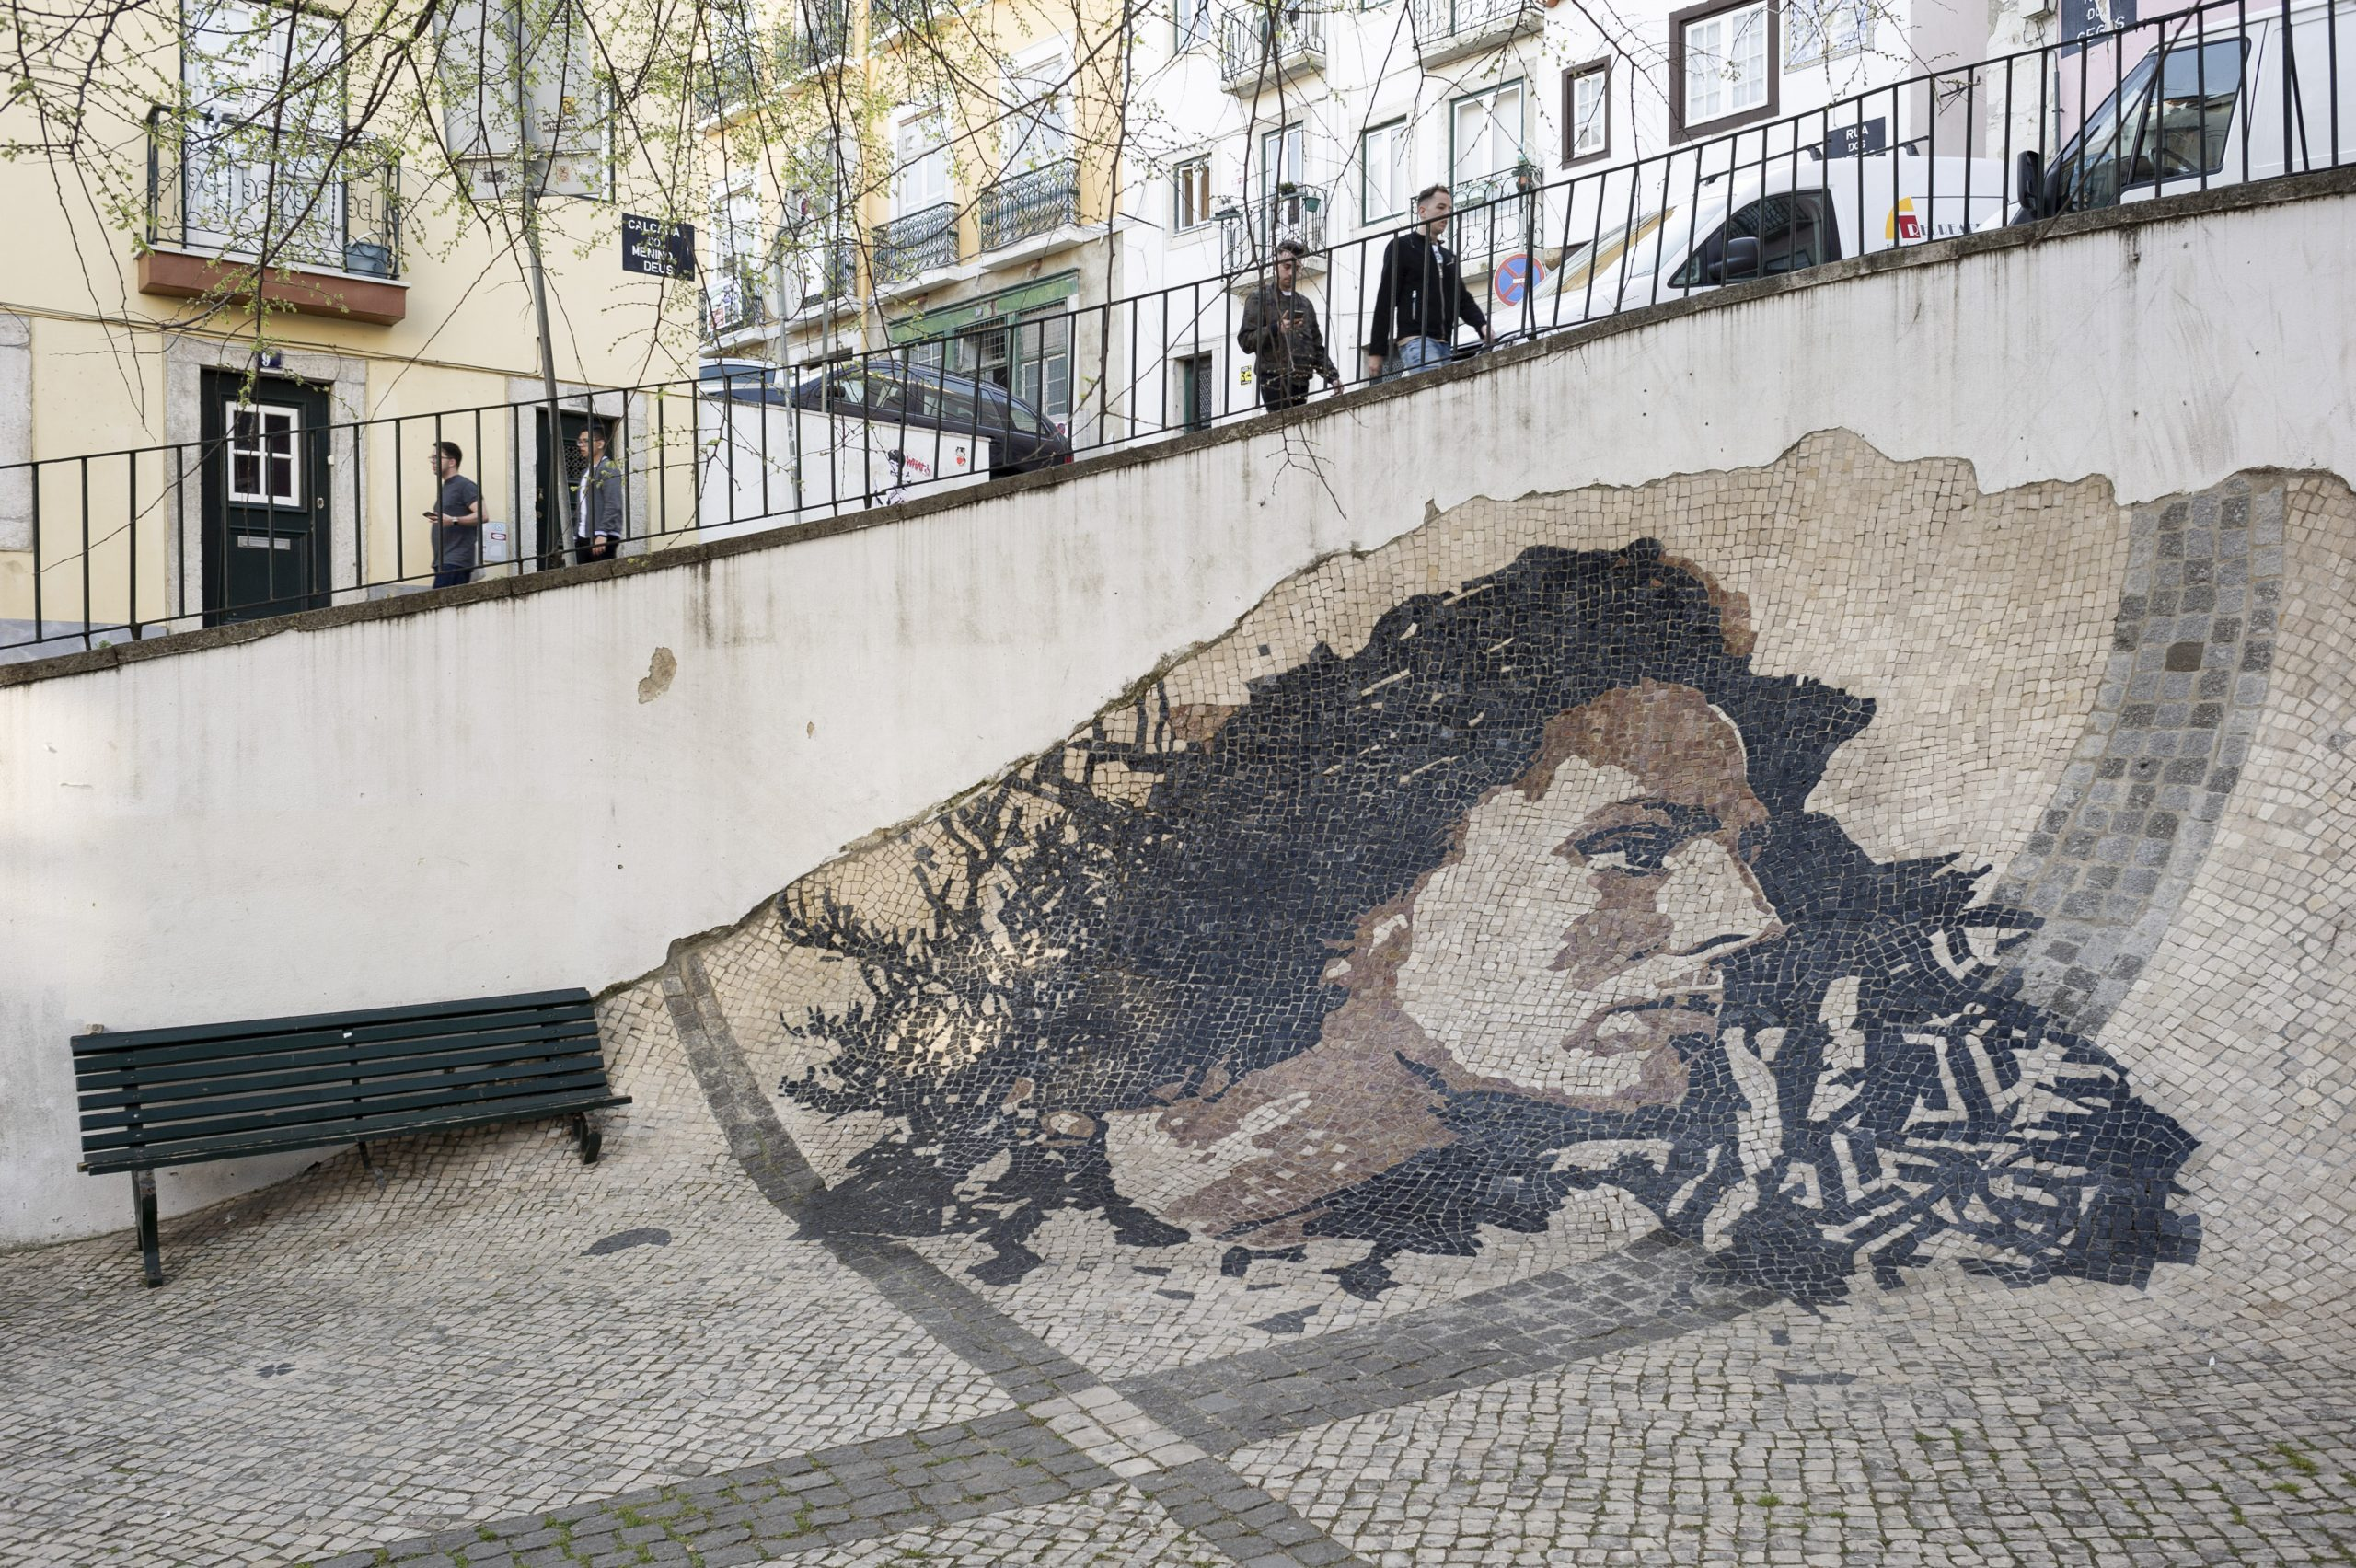 PORTUGAL-PAVERS-06